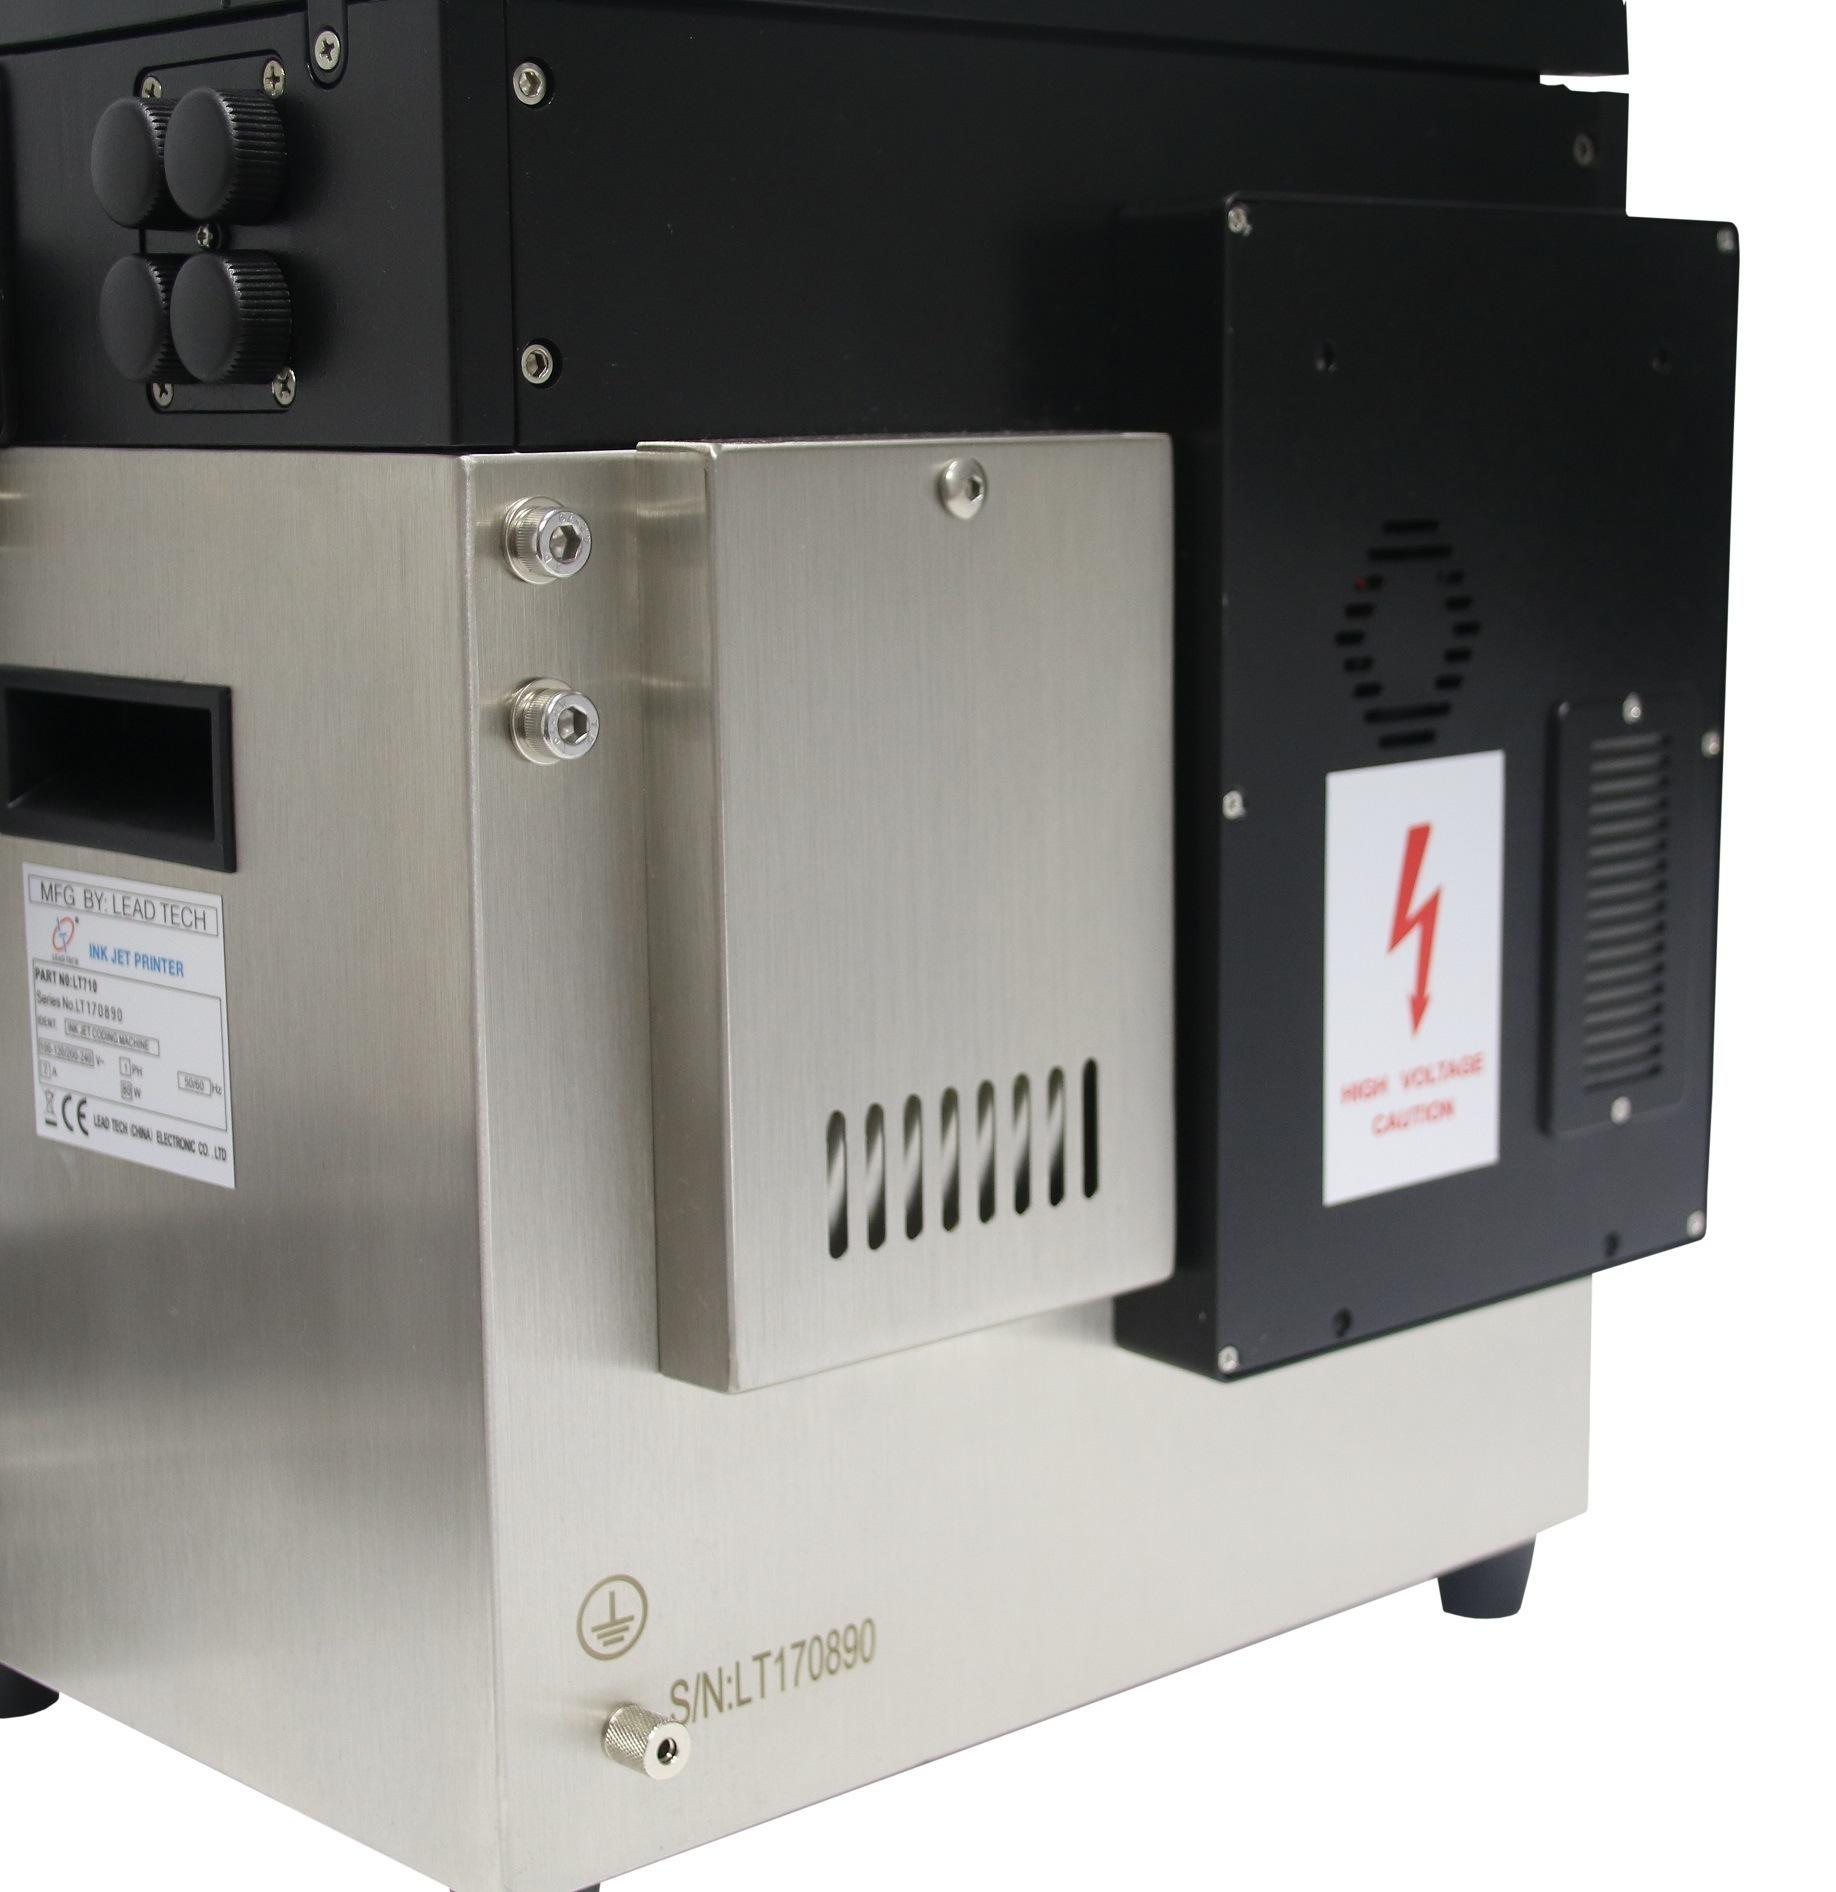 Lead Tech Lt760 Cij Inkjet Printer for PVC Pipe Coding